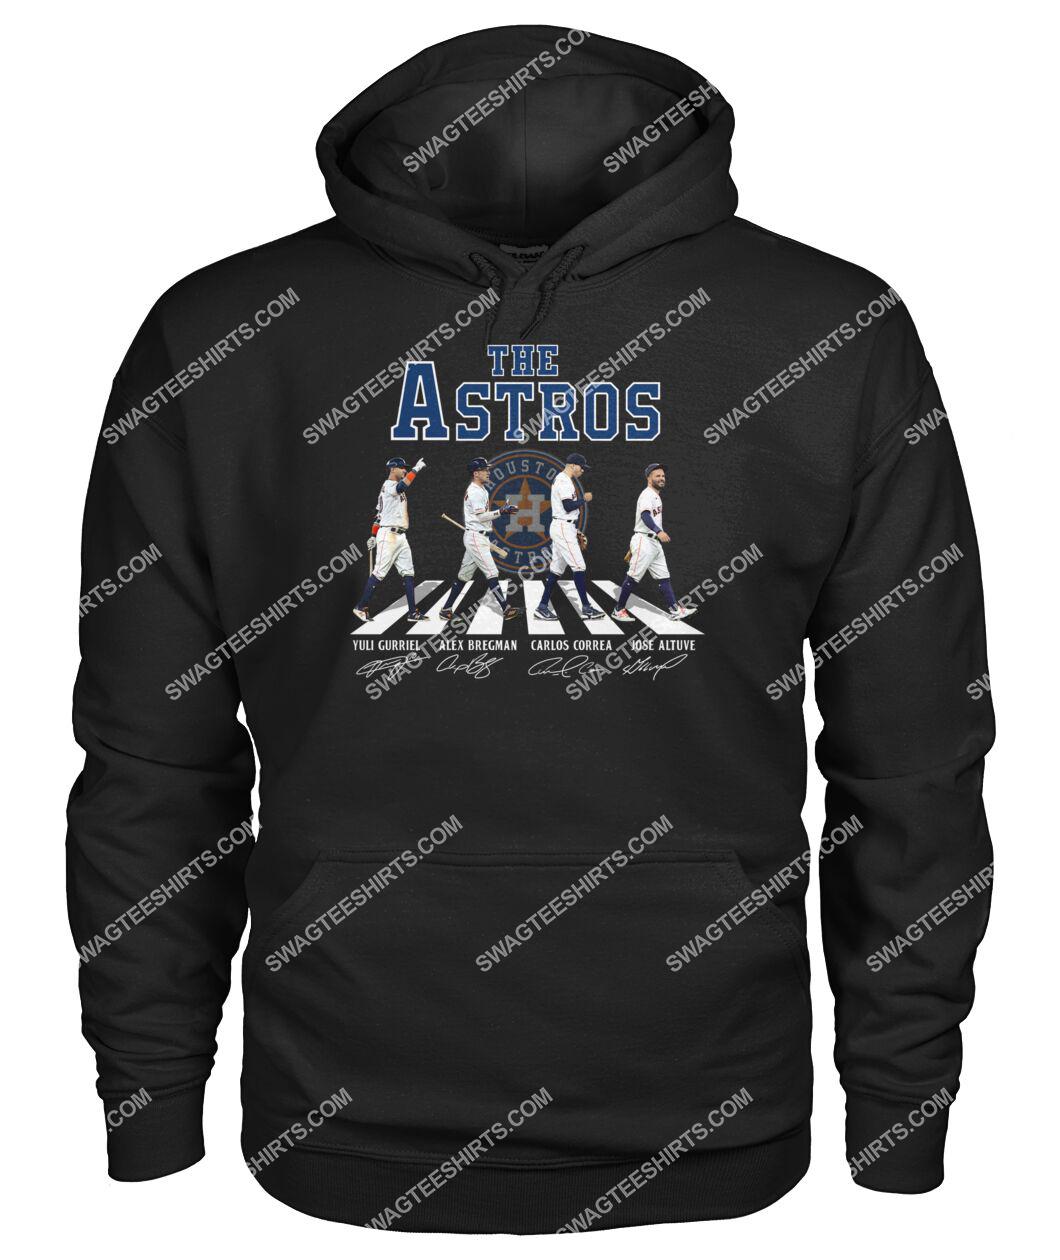 mlb houston astros signatures abbey road hoodie 1